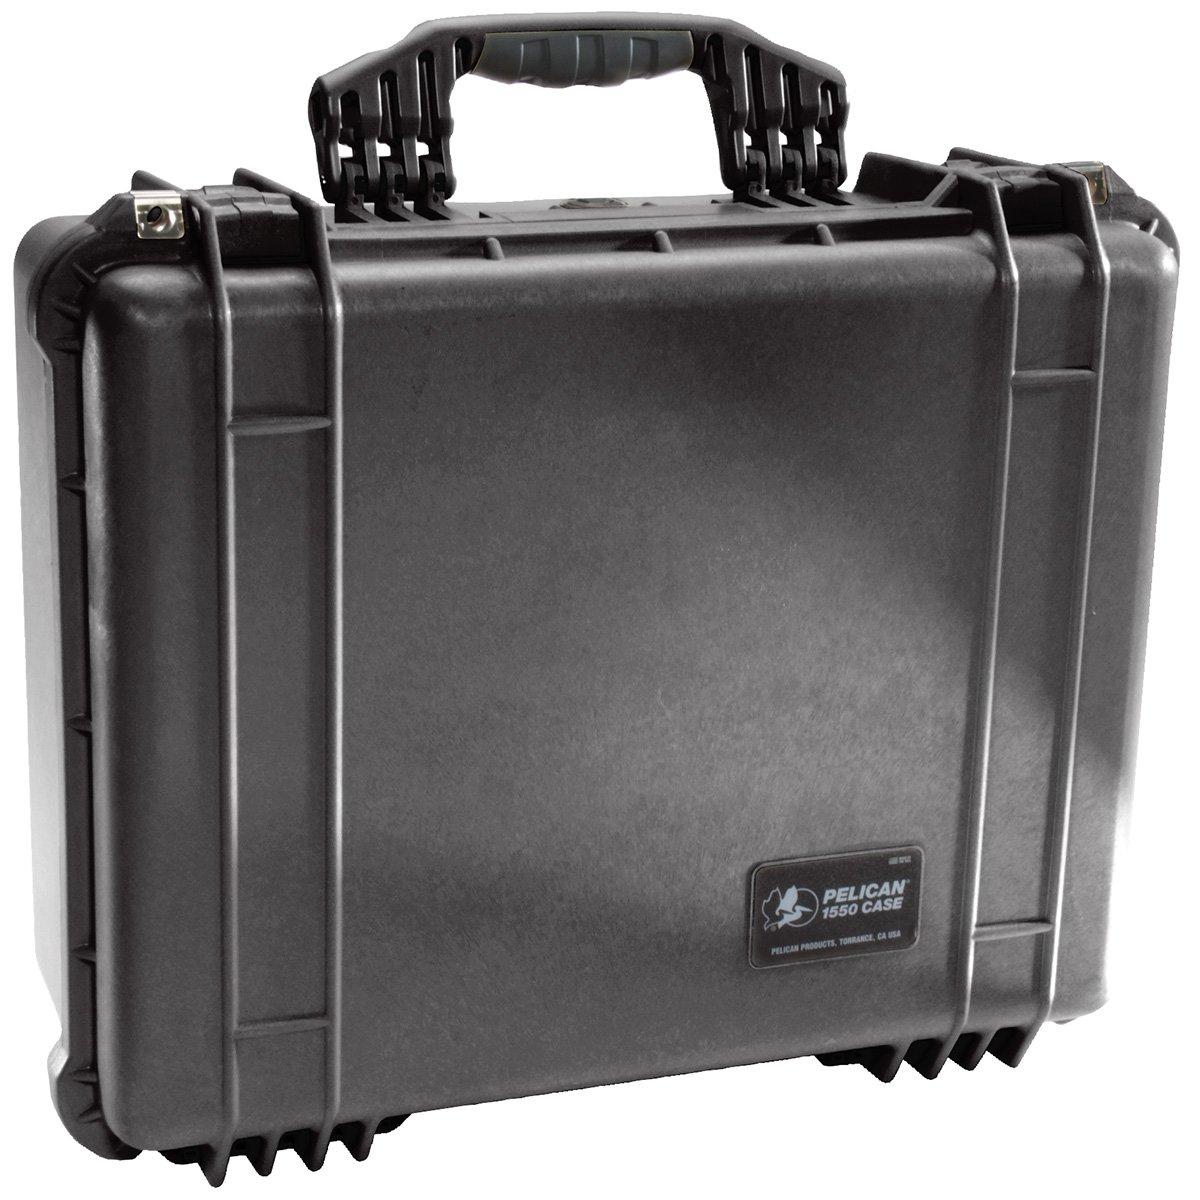 1550 Medium Case with TrekPak Case Divider System